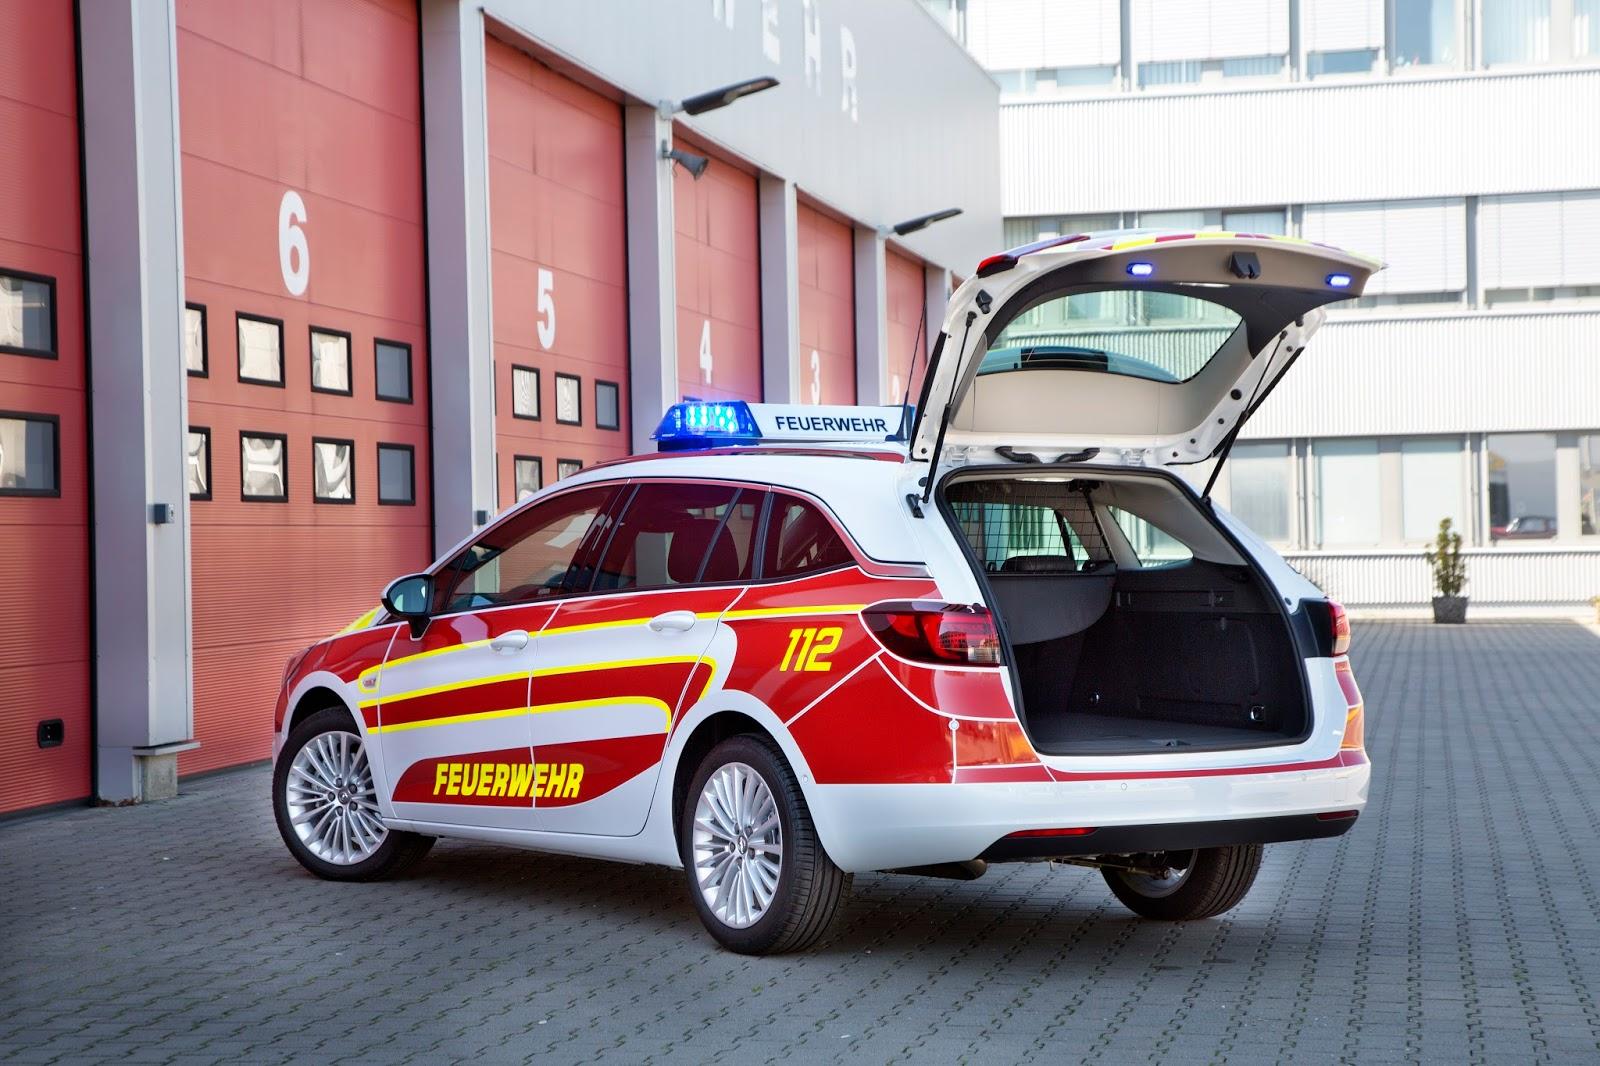 2016 Opel RETTmobil 301313 Το Opel Astra Sports Tourer ως όχημα άμεσης επέμβασης σε περιπτώσεις έκτακτης ανάγκης Opel, Opel Astra Sports Tourer, Opel Movano, RETTmobil, Έκθεση, Επαγγελματικά